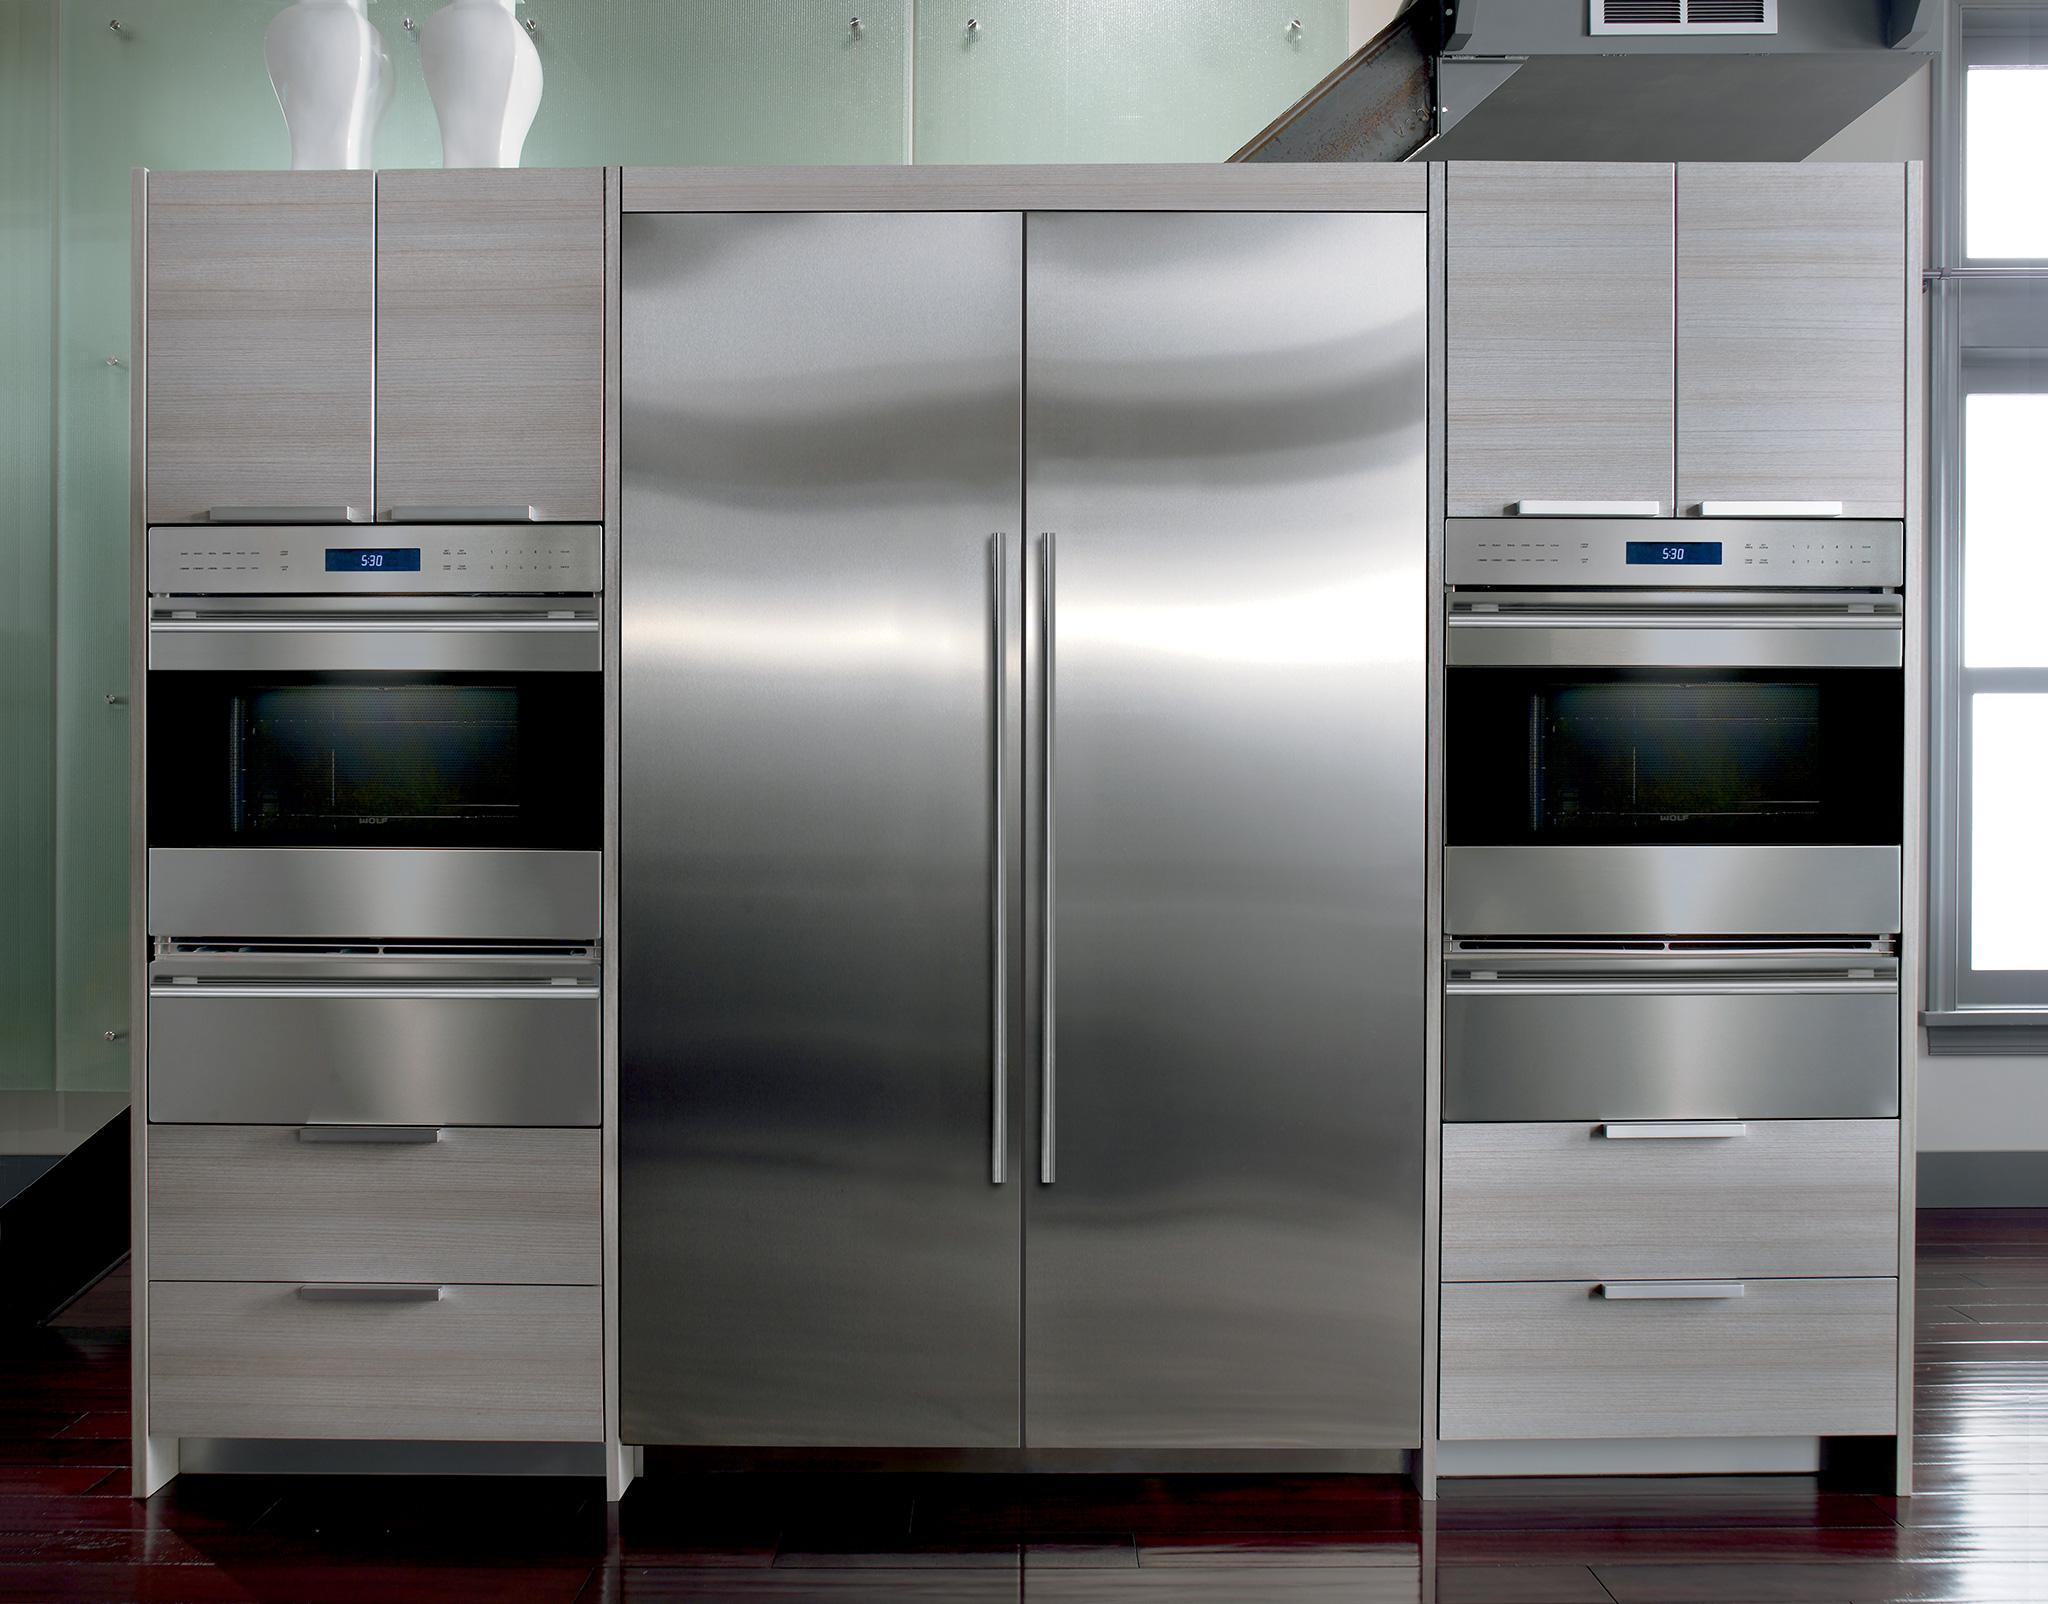 Sub Zero Model Ic24rrh Caplan S Appliances Toronto